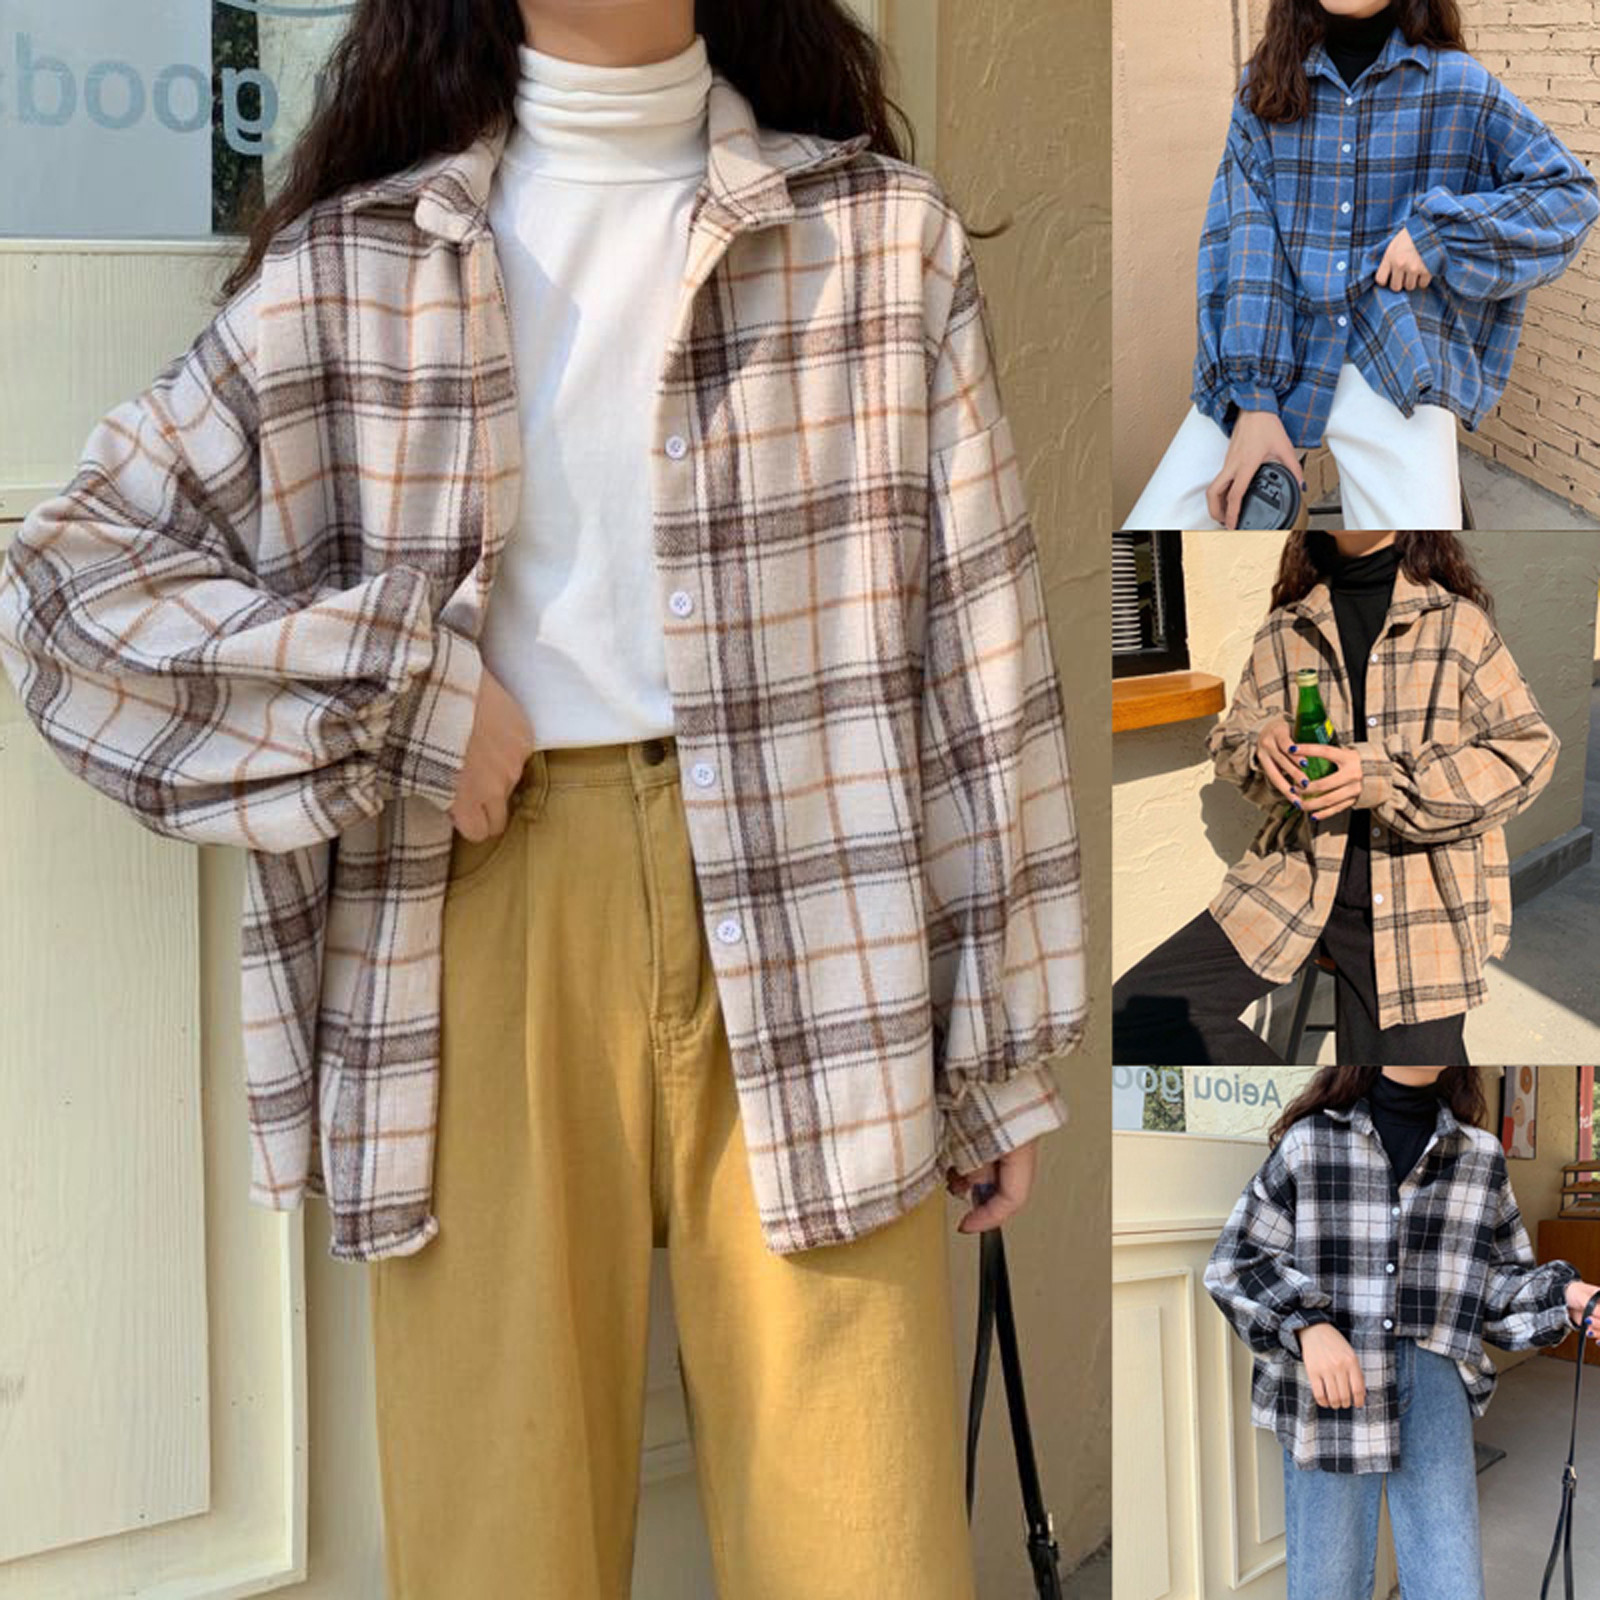 40# Women Plaid Warm Shirt Female Jacket Checked Coat Casual Turn down Collar Long Sleeve Autumn Blouse Fashion Loose Top